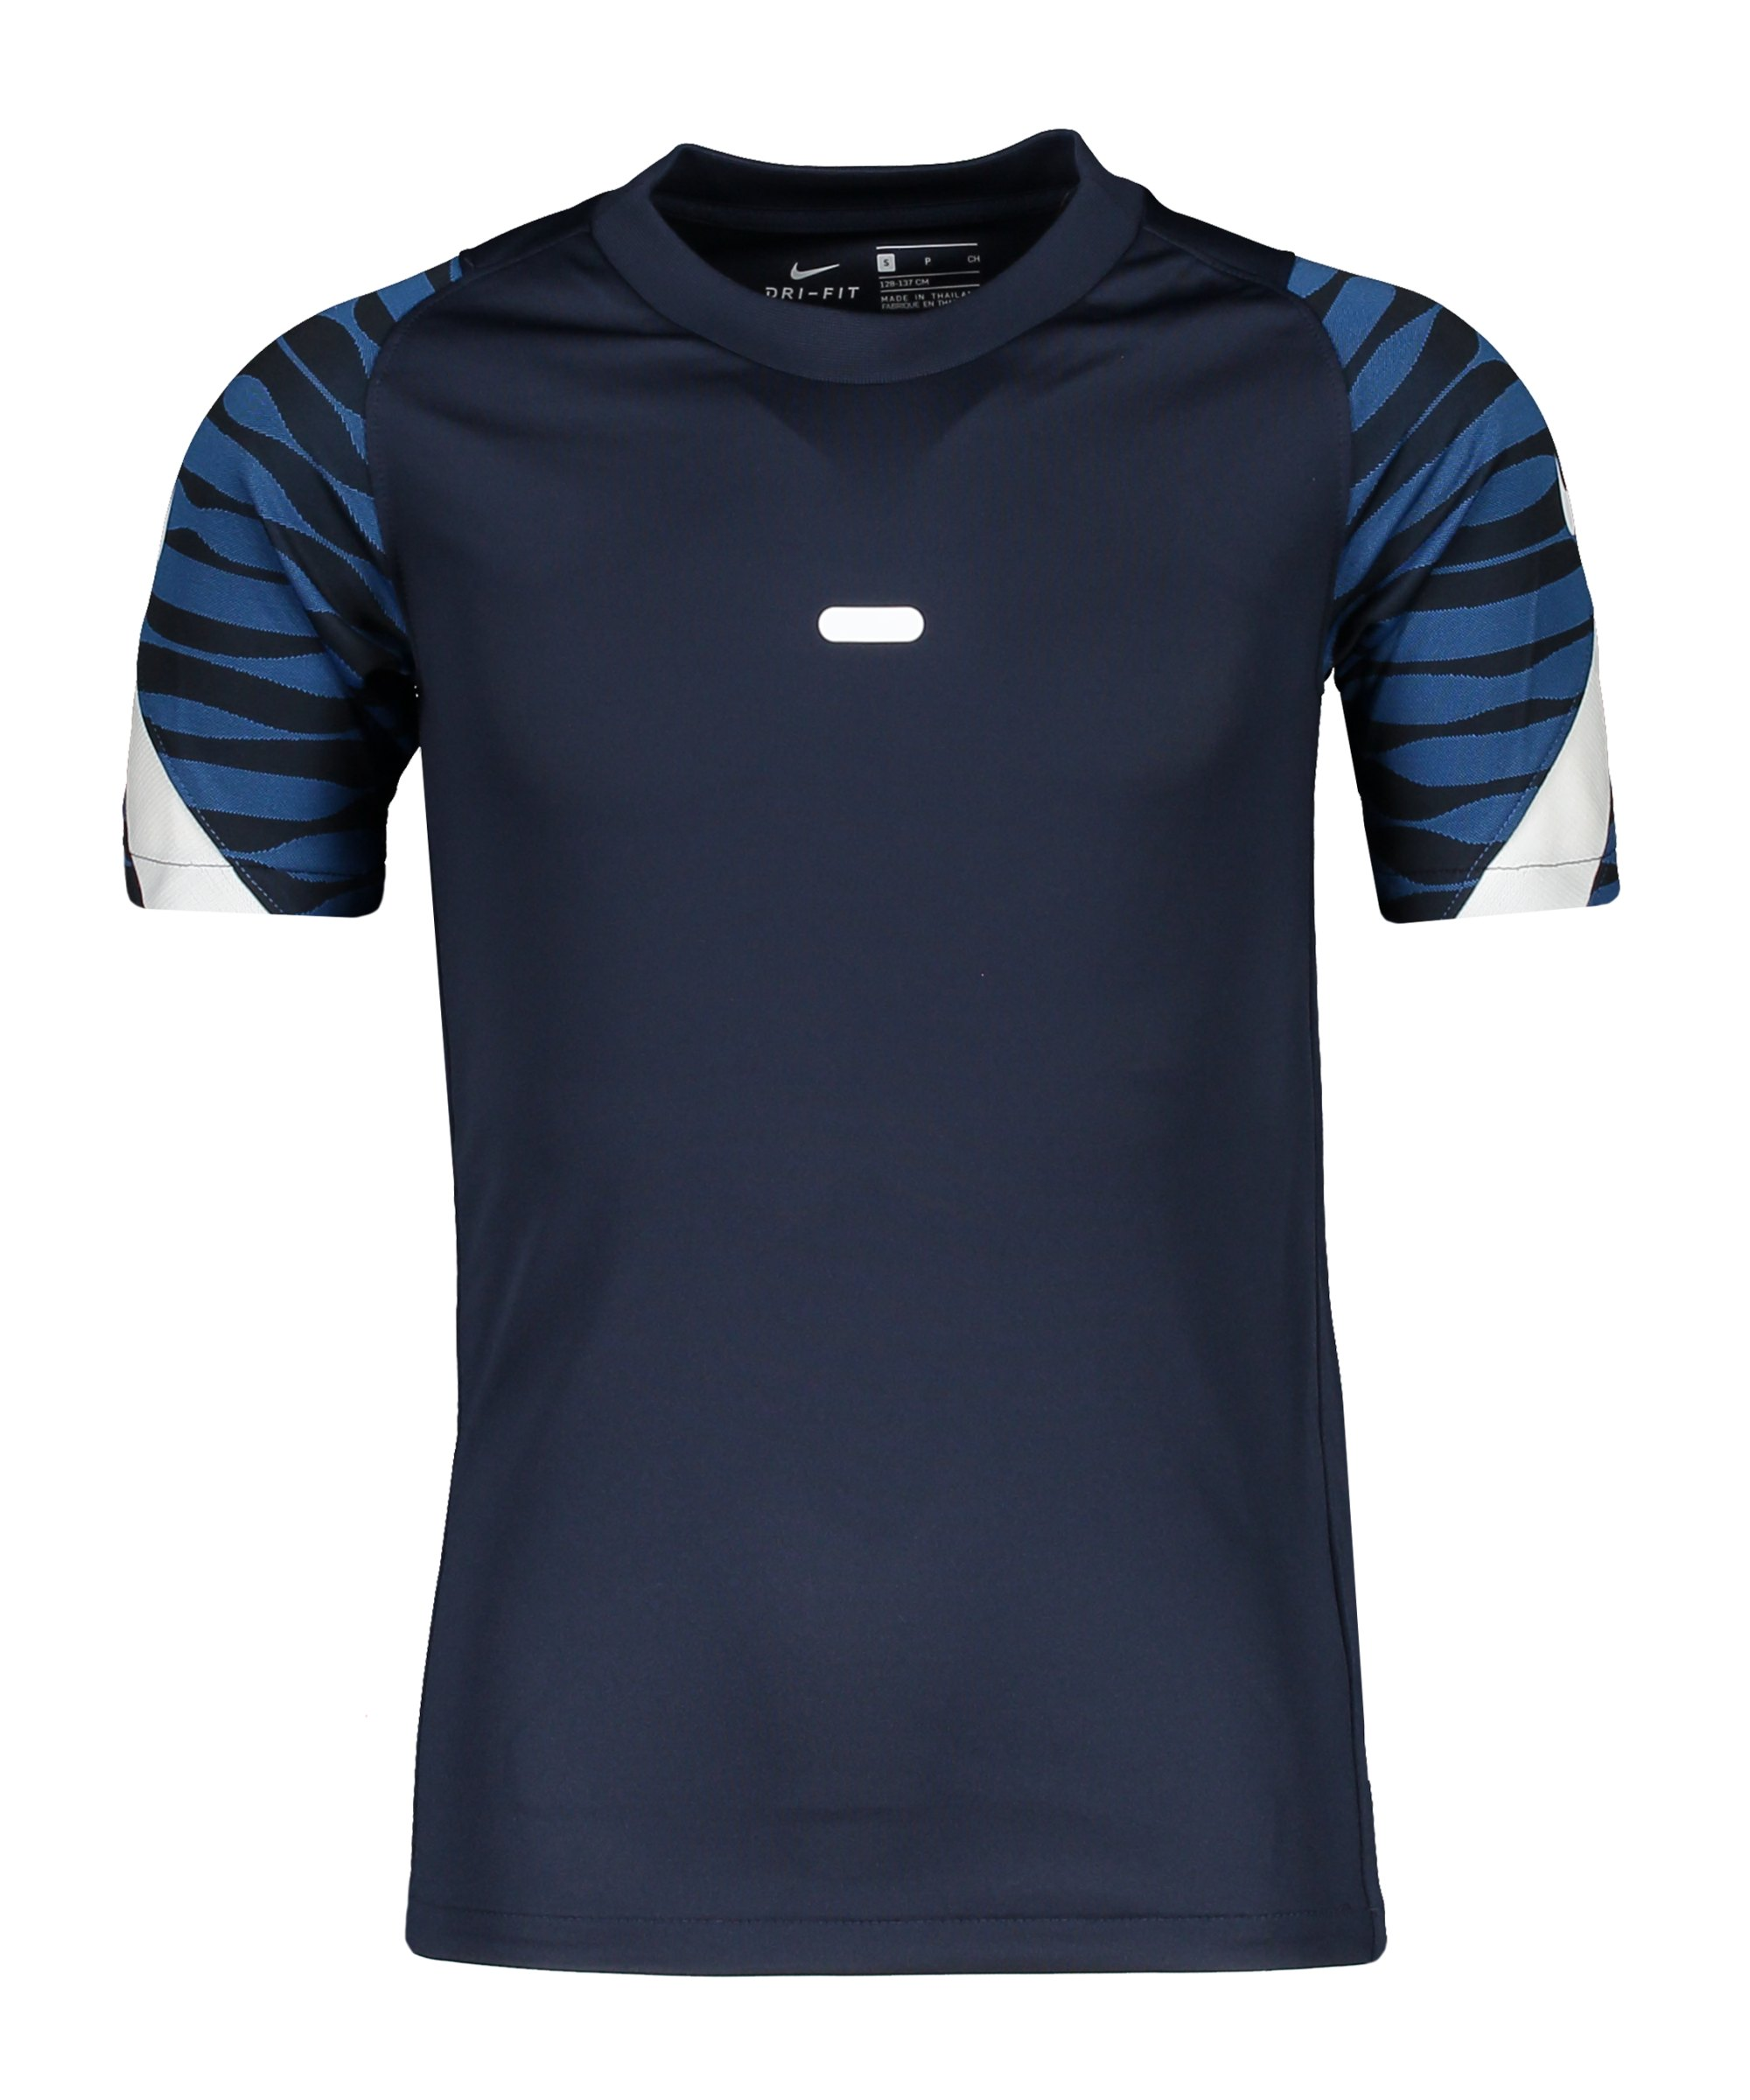 Nike Strike 21 T-Shirt Blau Weiss F451 - blau